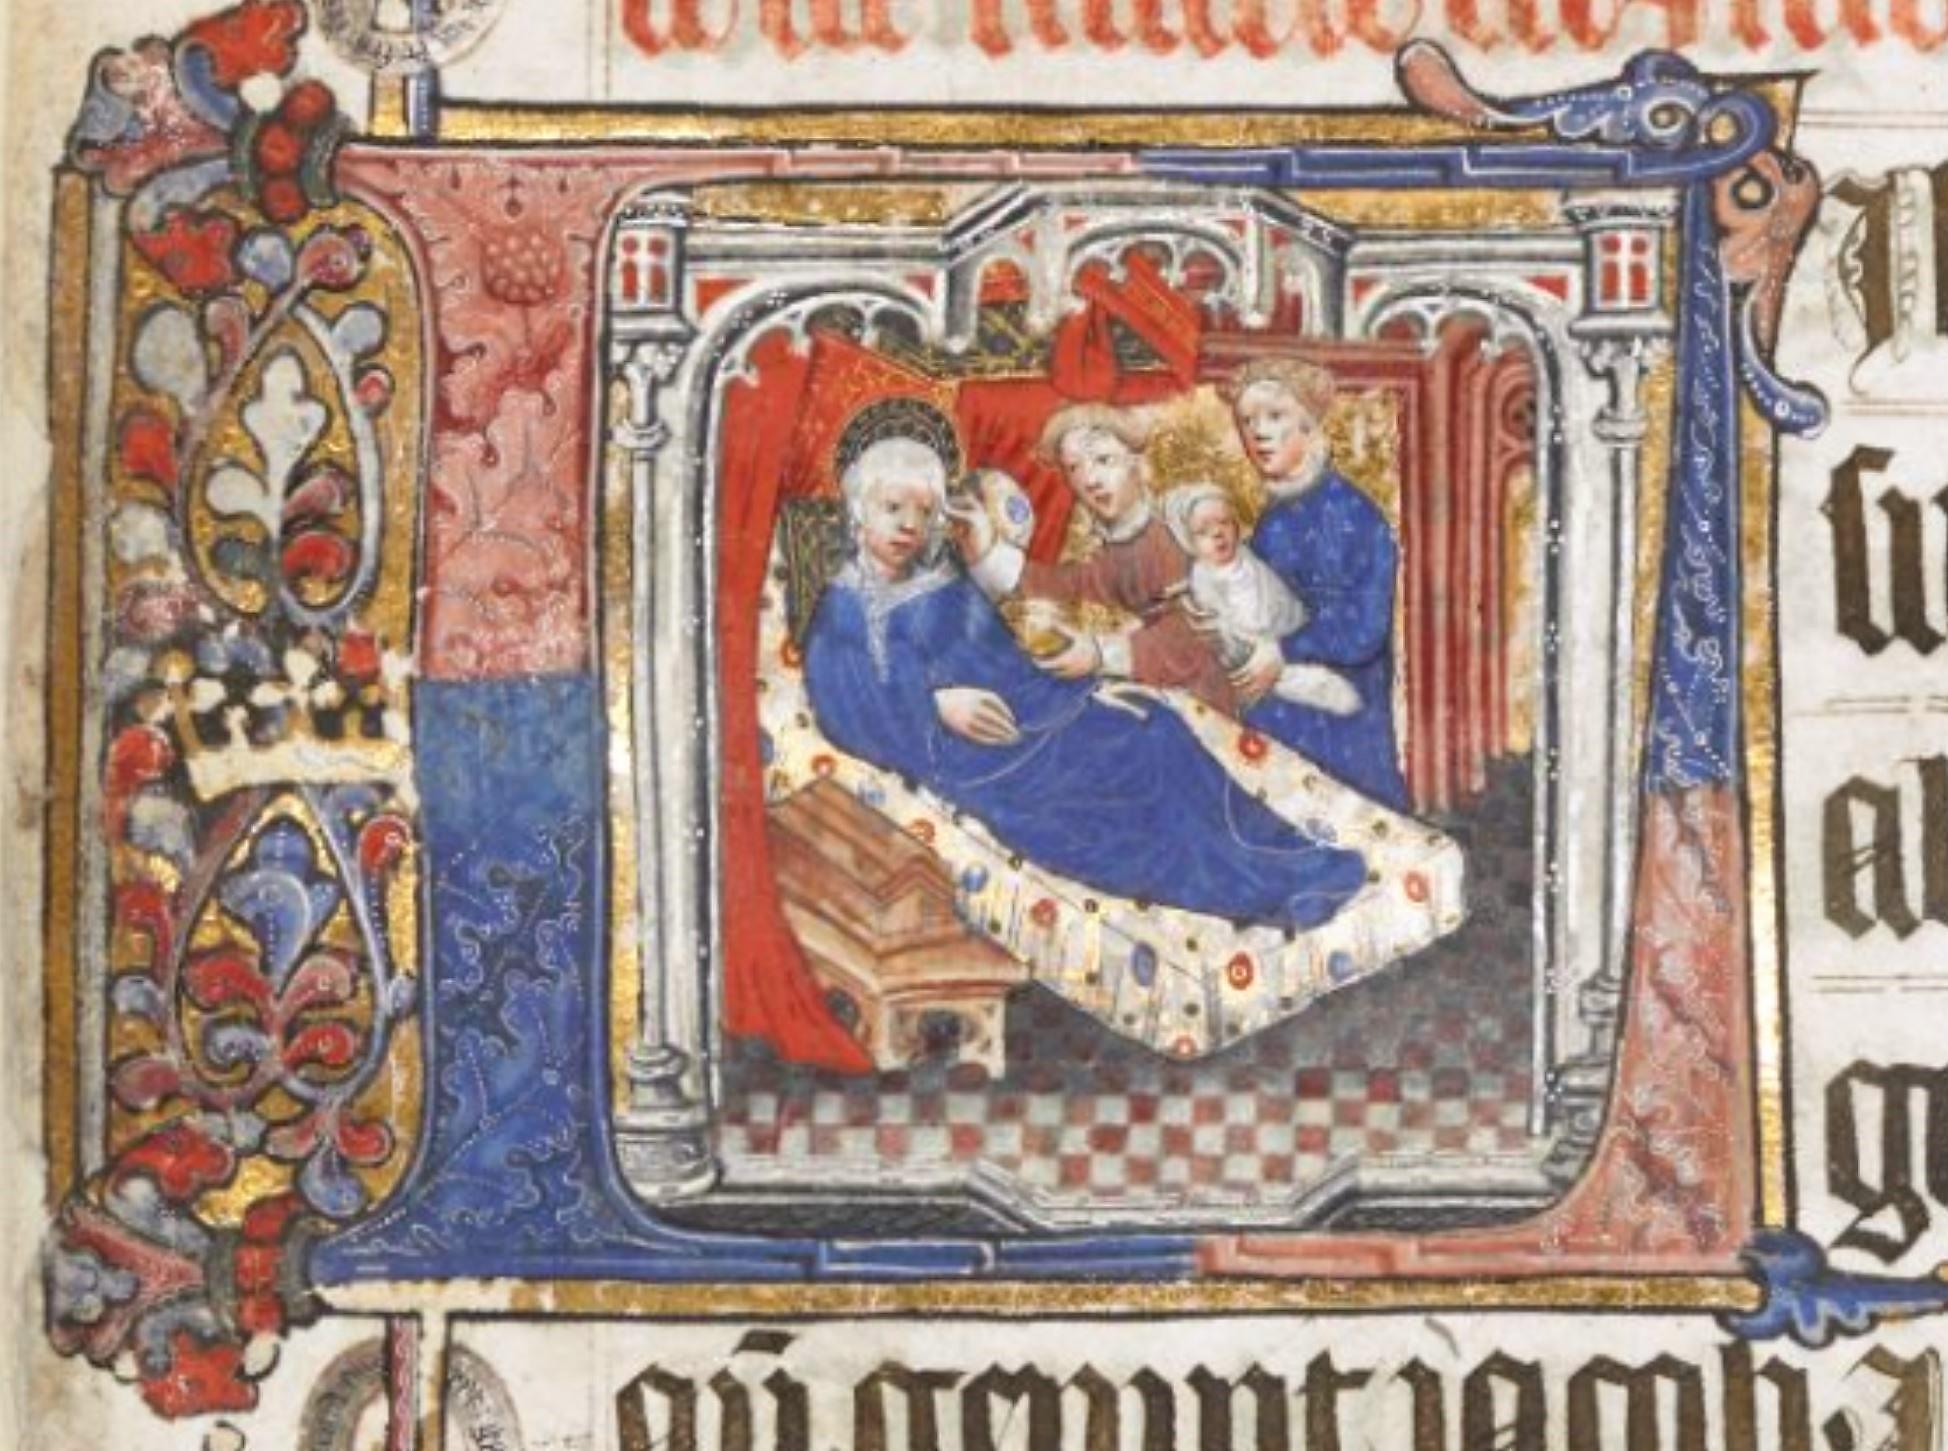 Naissance de Saint Jean Baptiste Lovell Lectionary 1400-10 BL Harley 7026 fol 17r detail